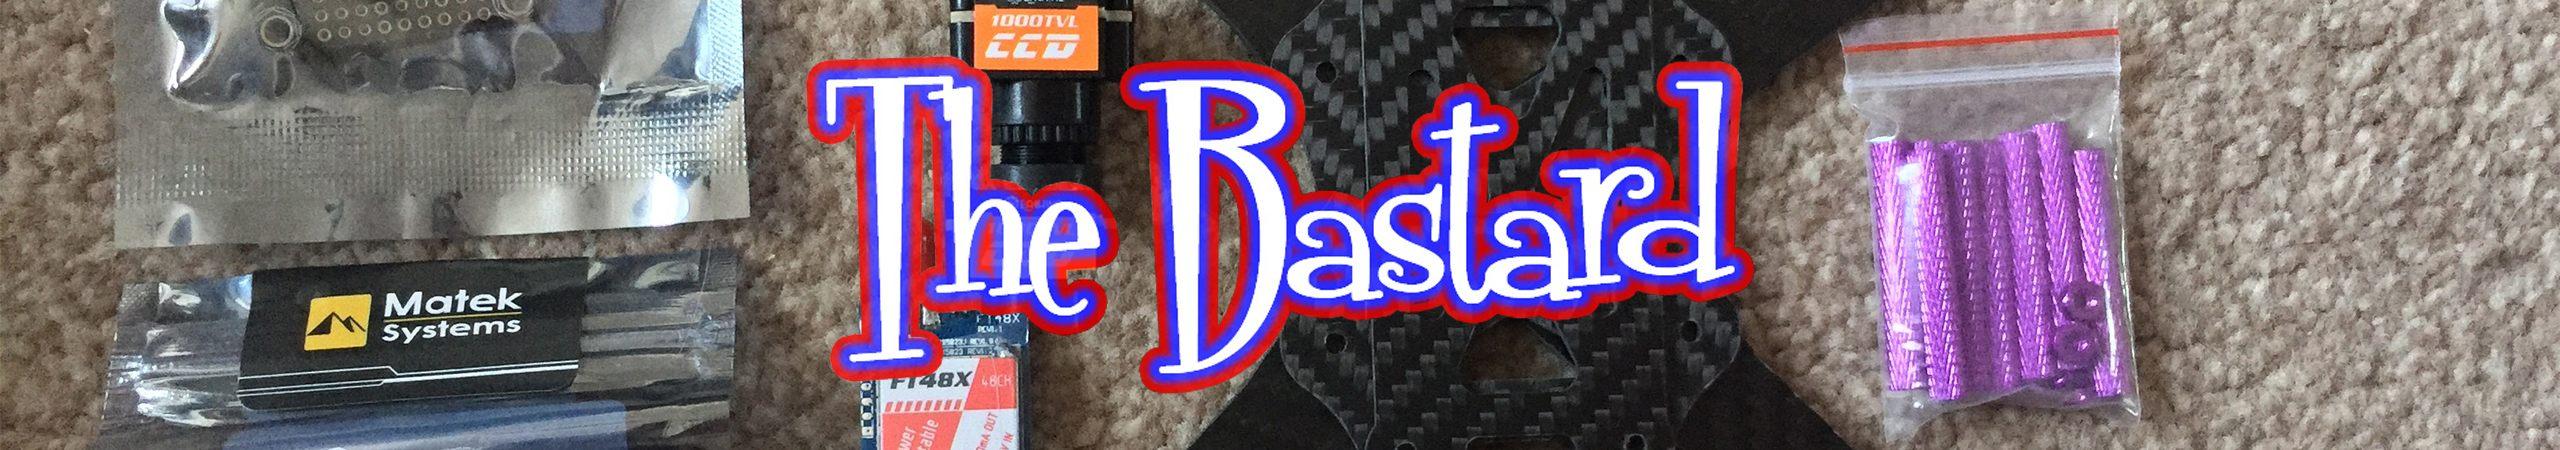 The Bastard Kwad Header